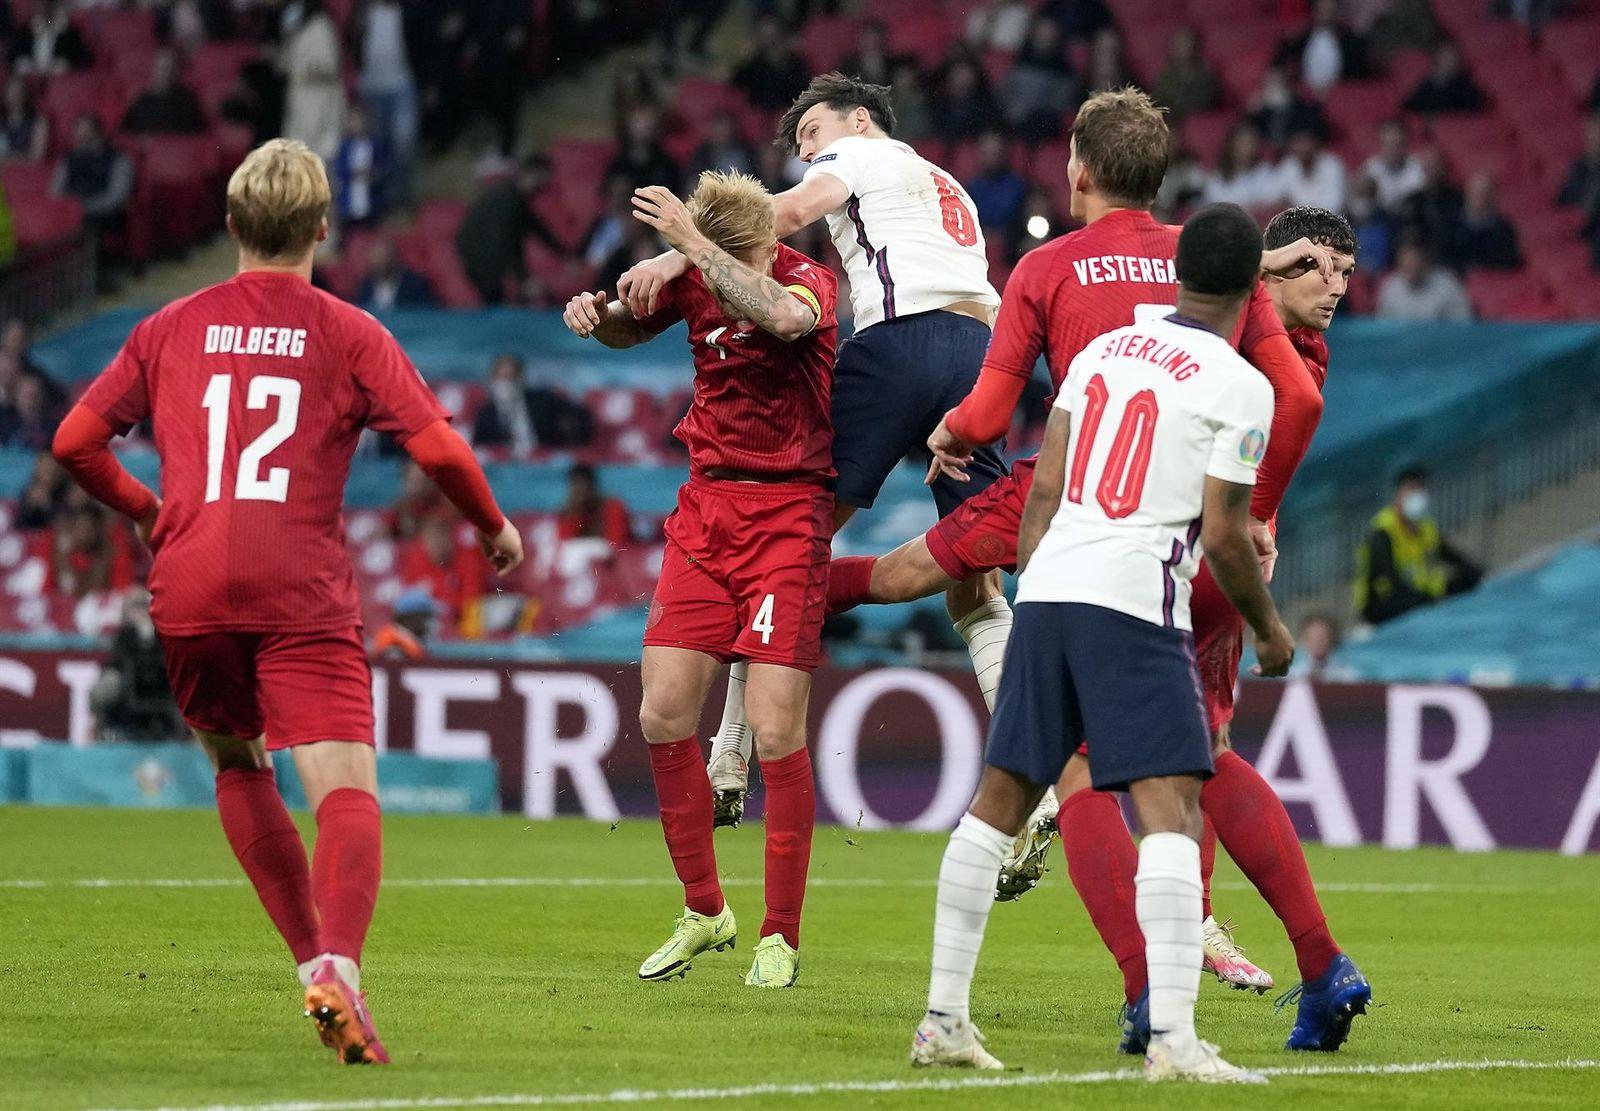 Harry Kane lleva a Inglaterra a la final de la Eurocopa; van contra Italia